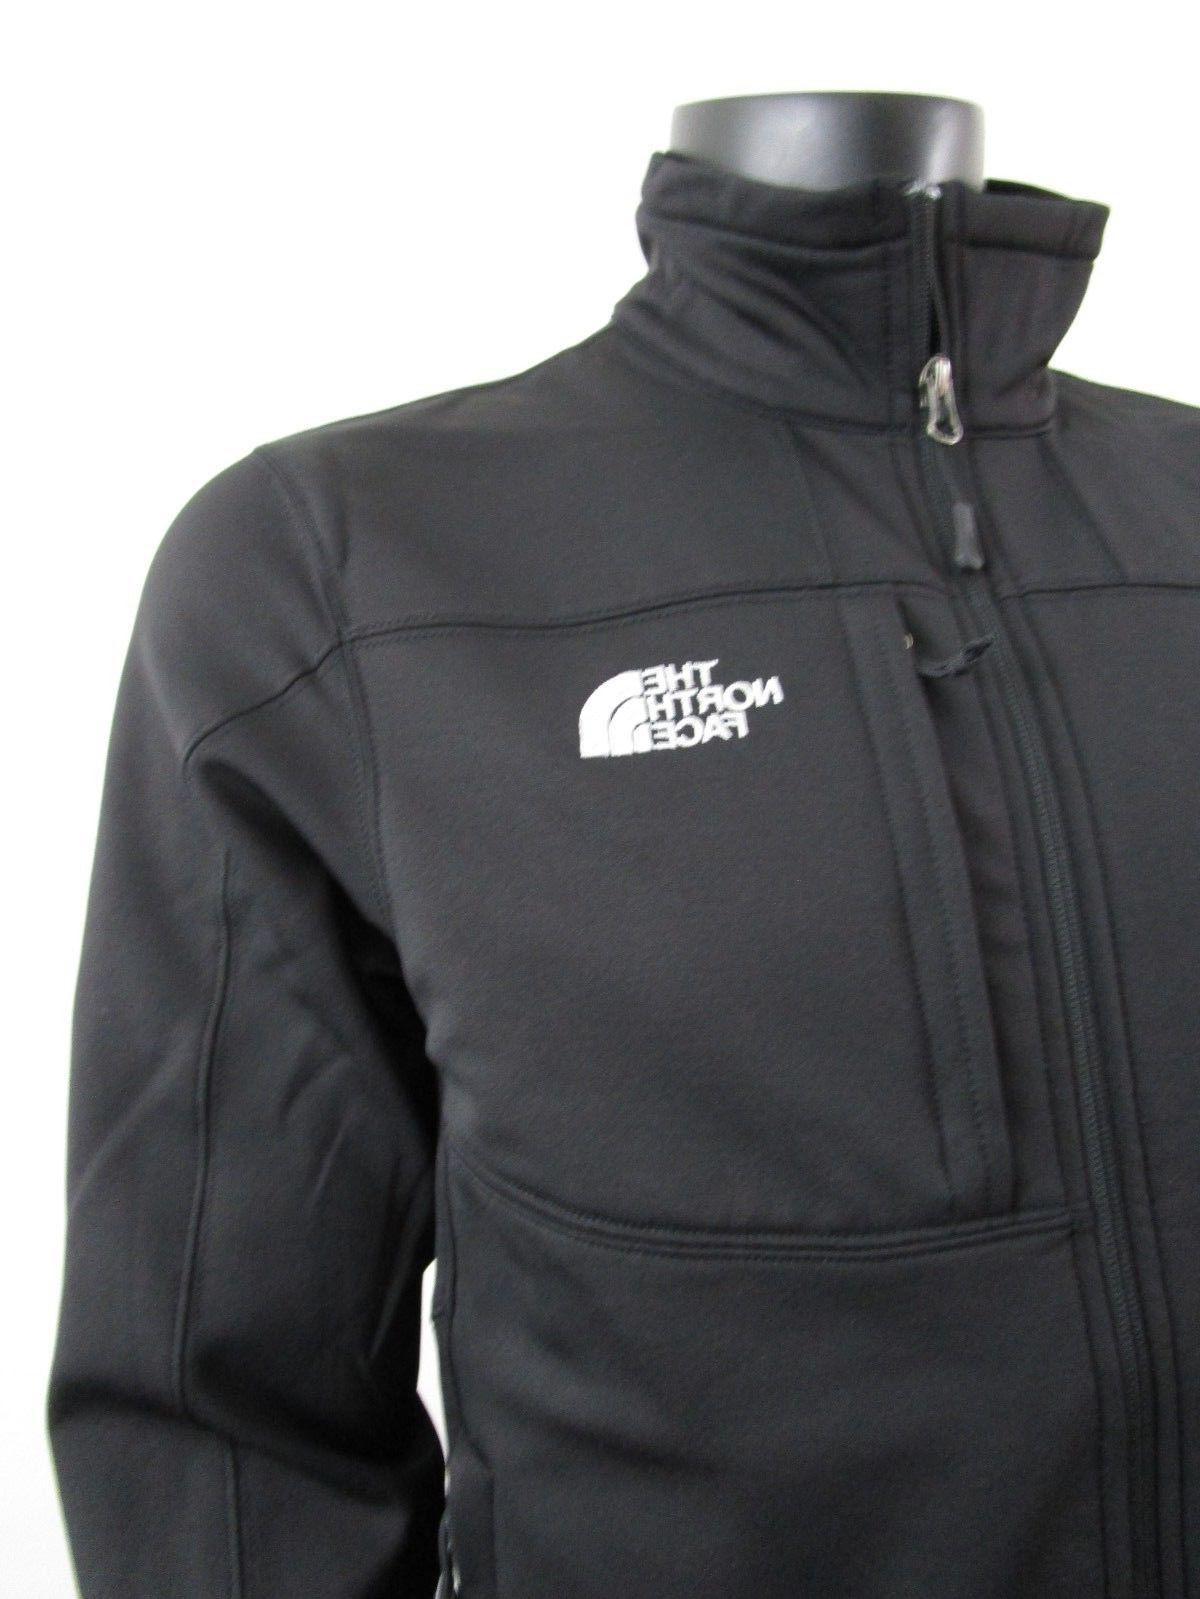 UPDATED Mens TNF The North Cinder FZ Jacket Black